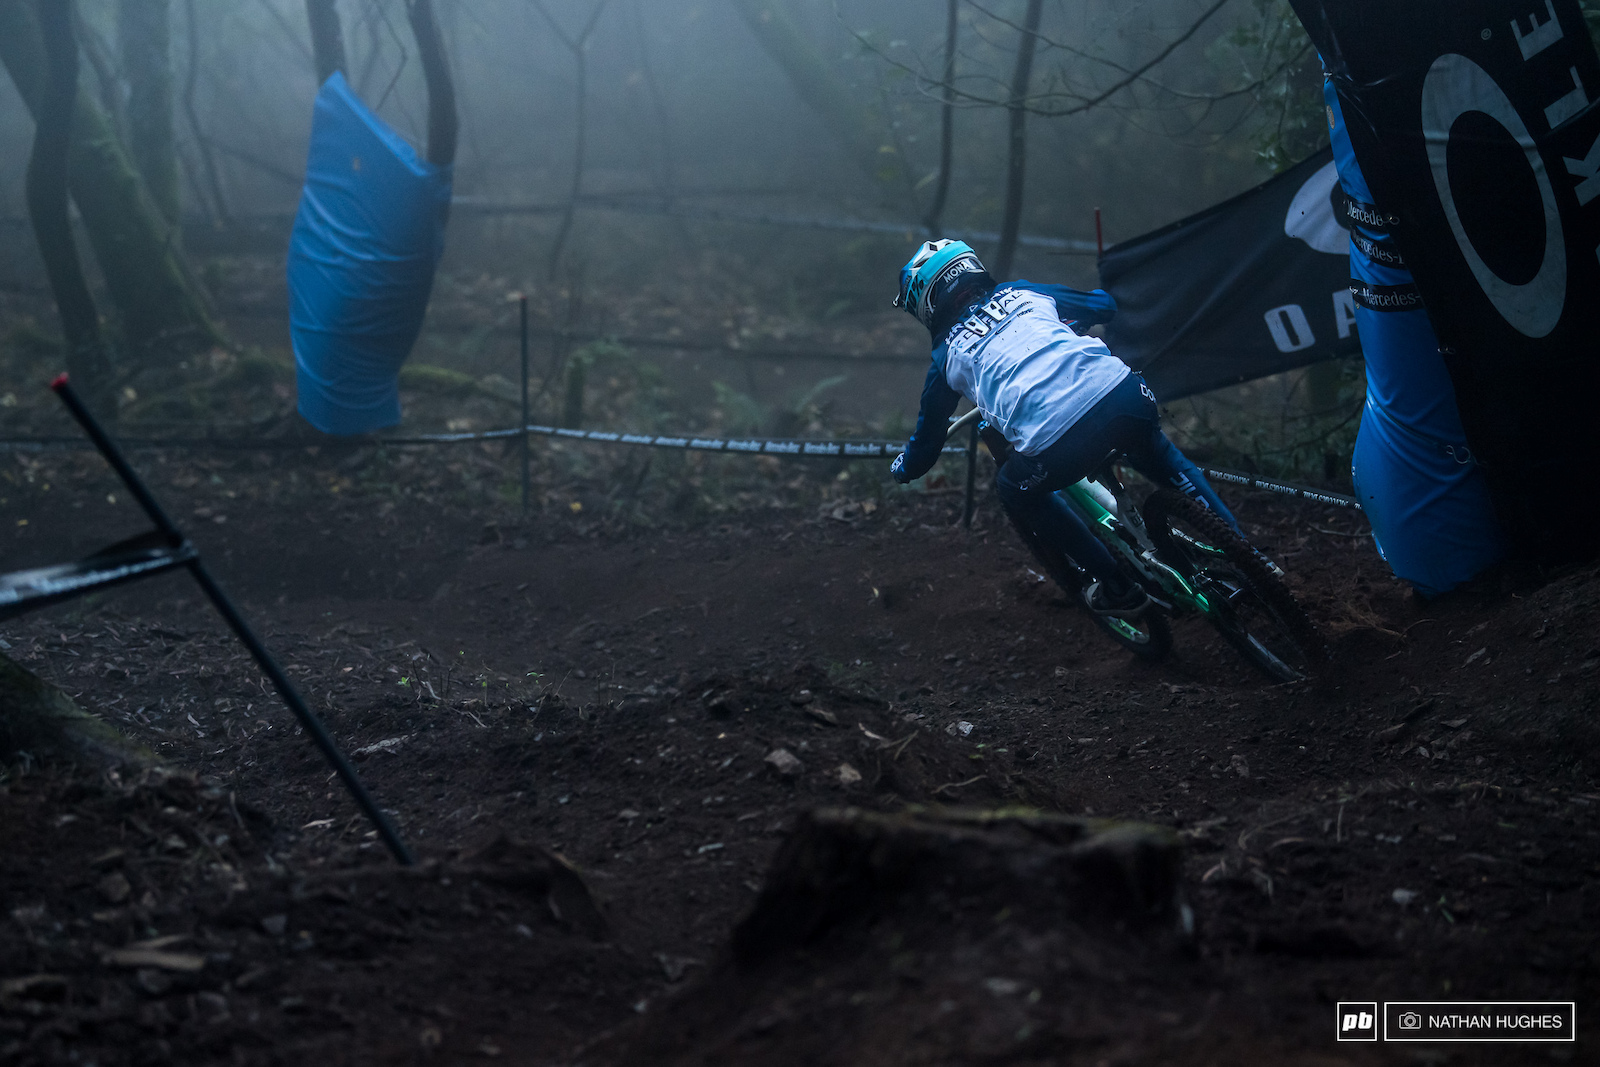 Monika Hrastnik delving deep into the misty last forest section.